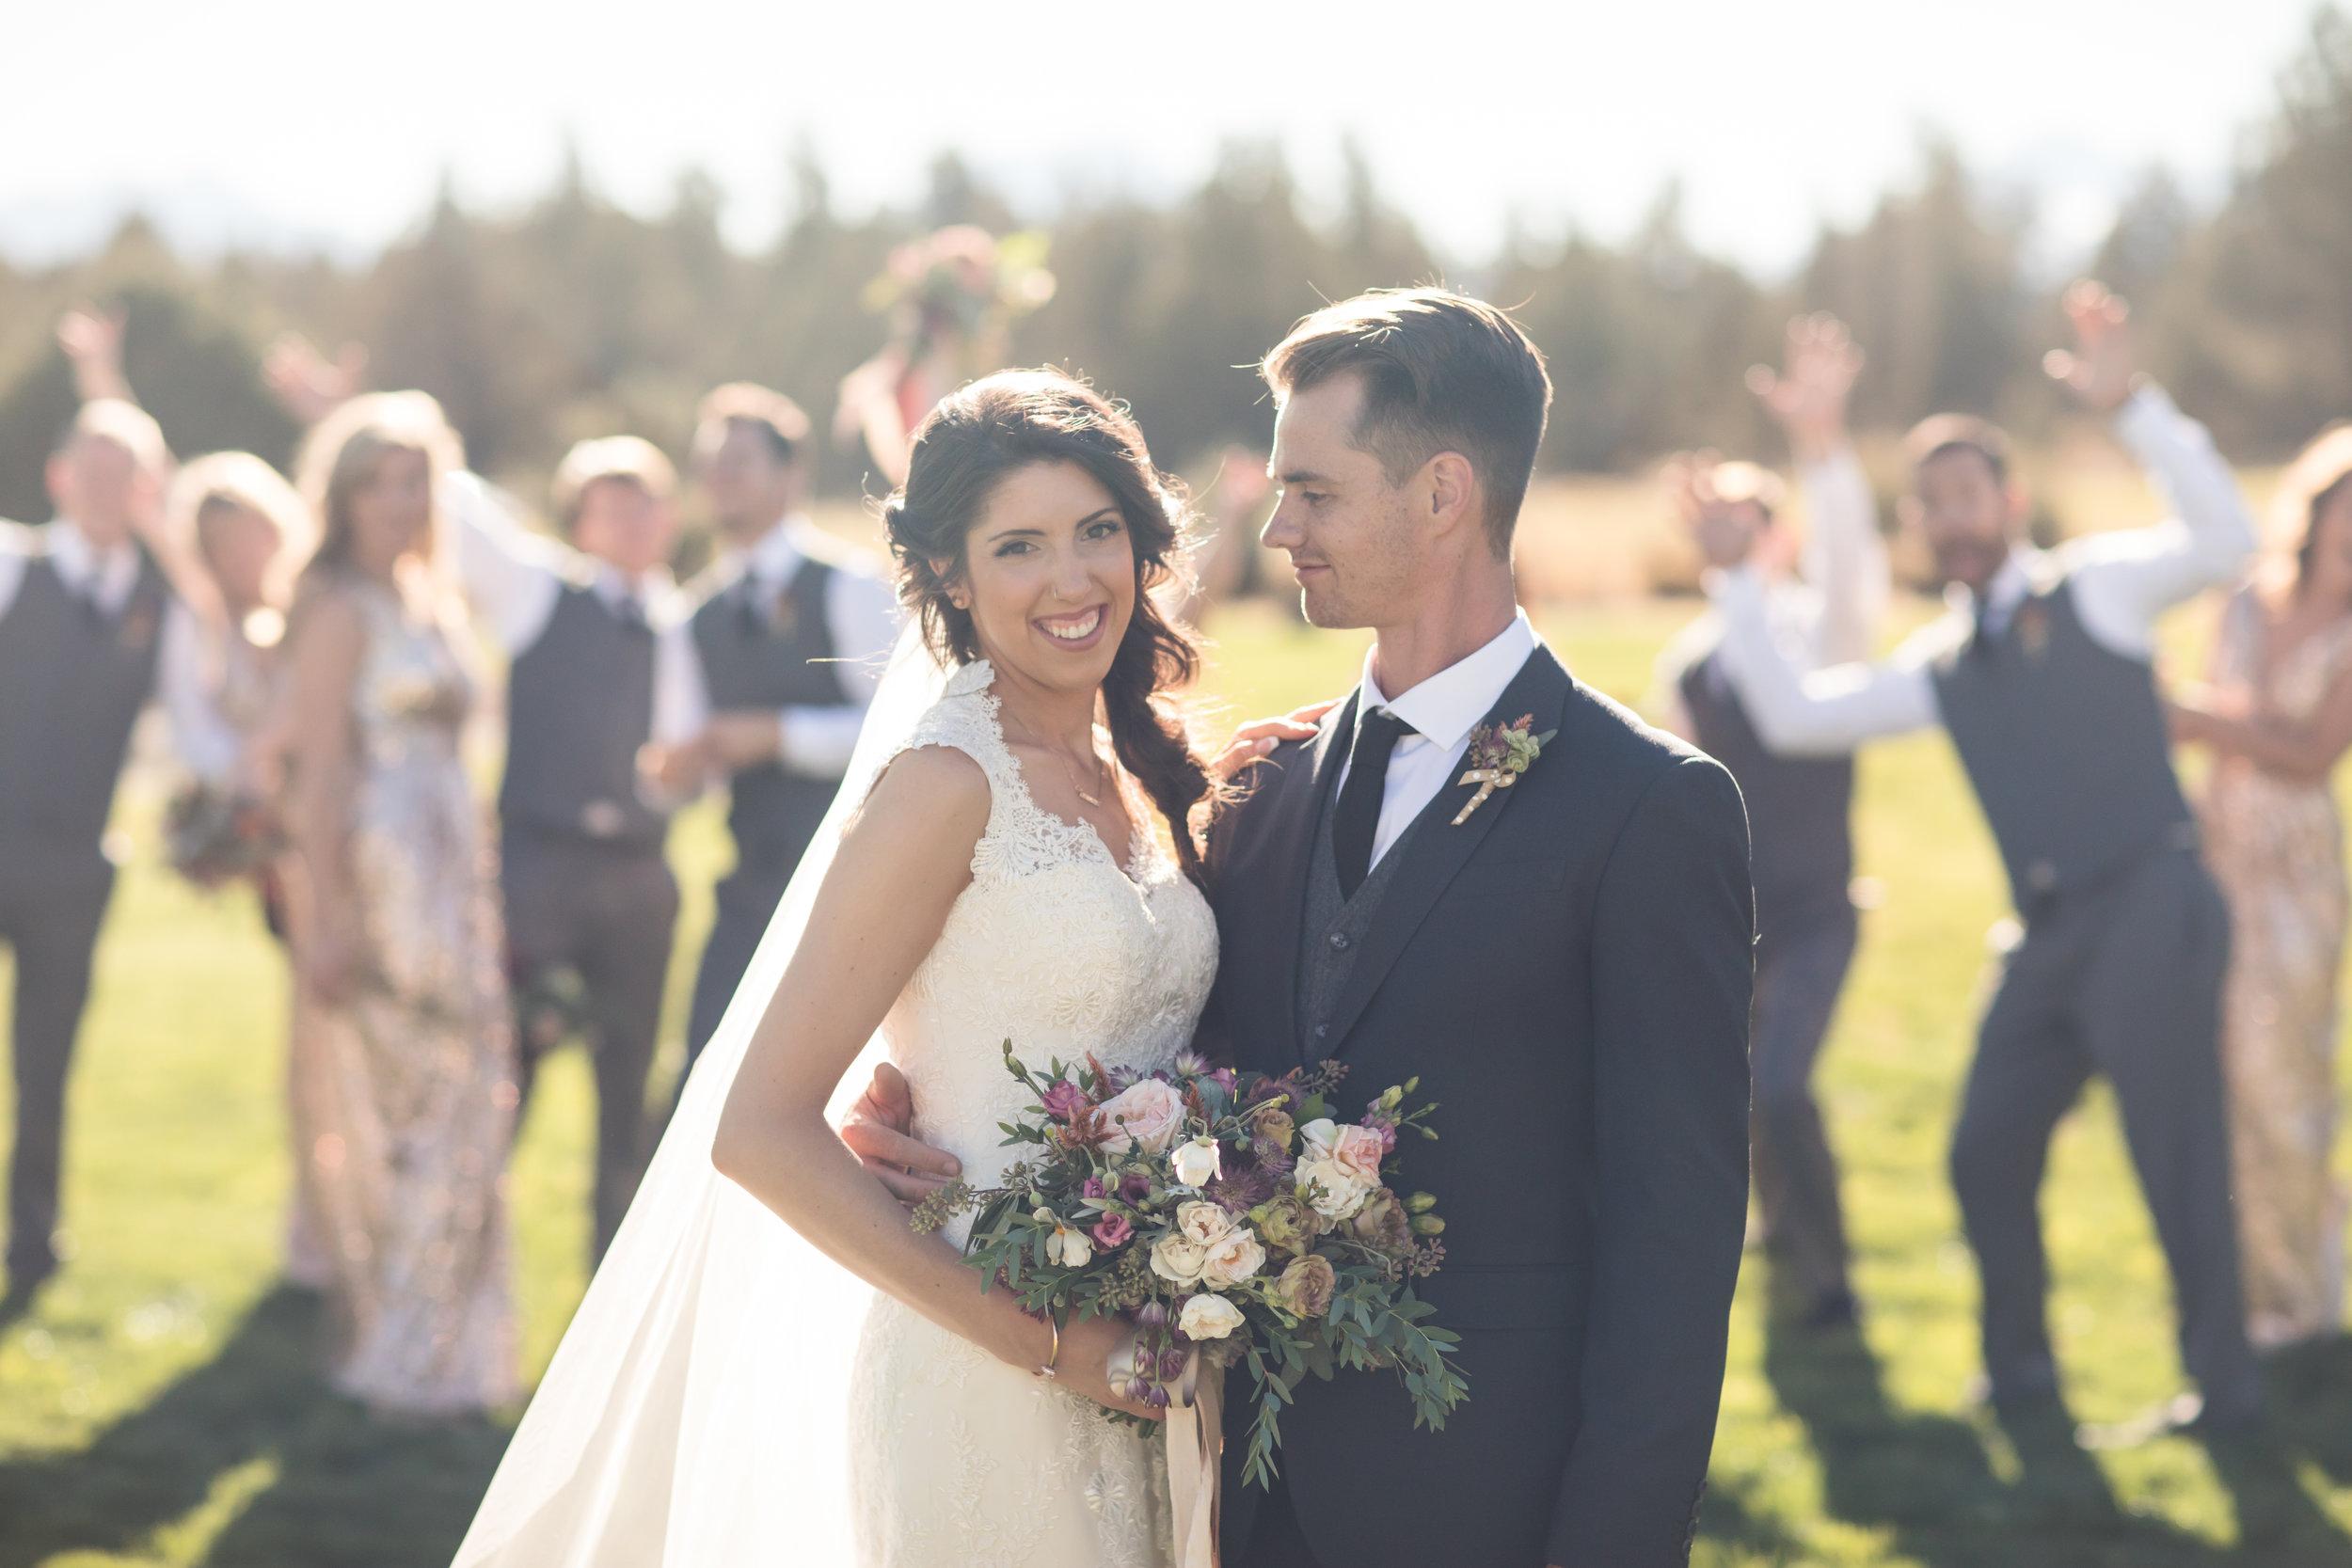 BrideGroomBendOregon